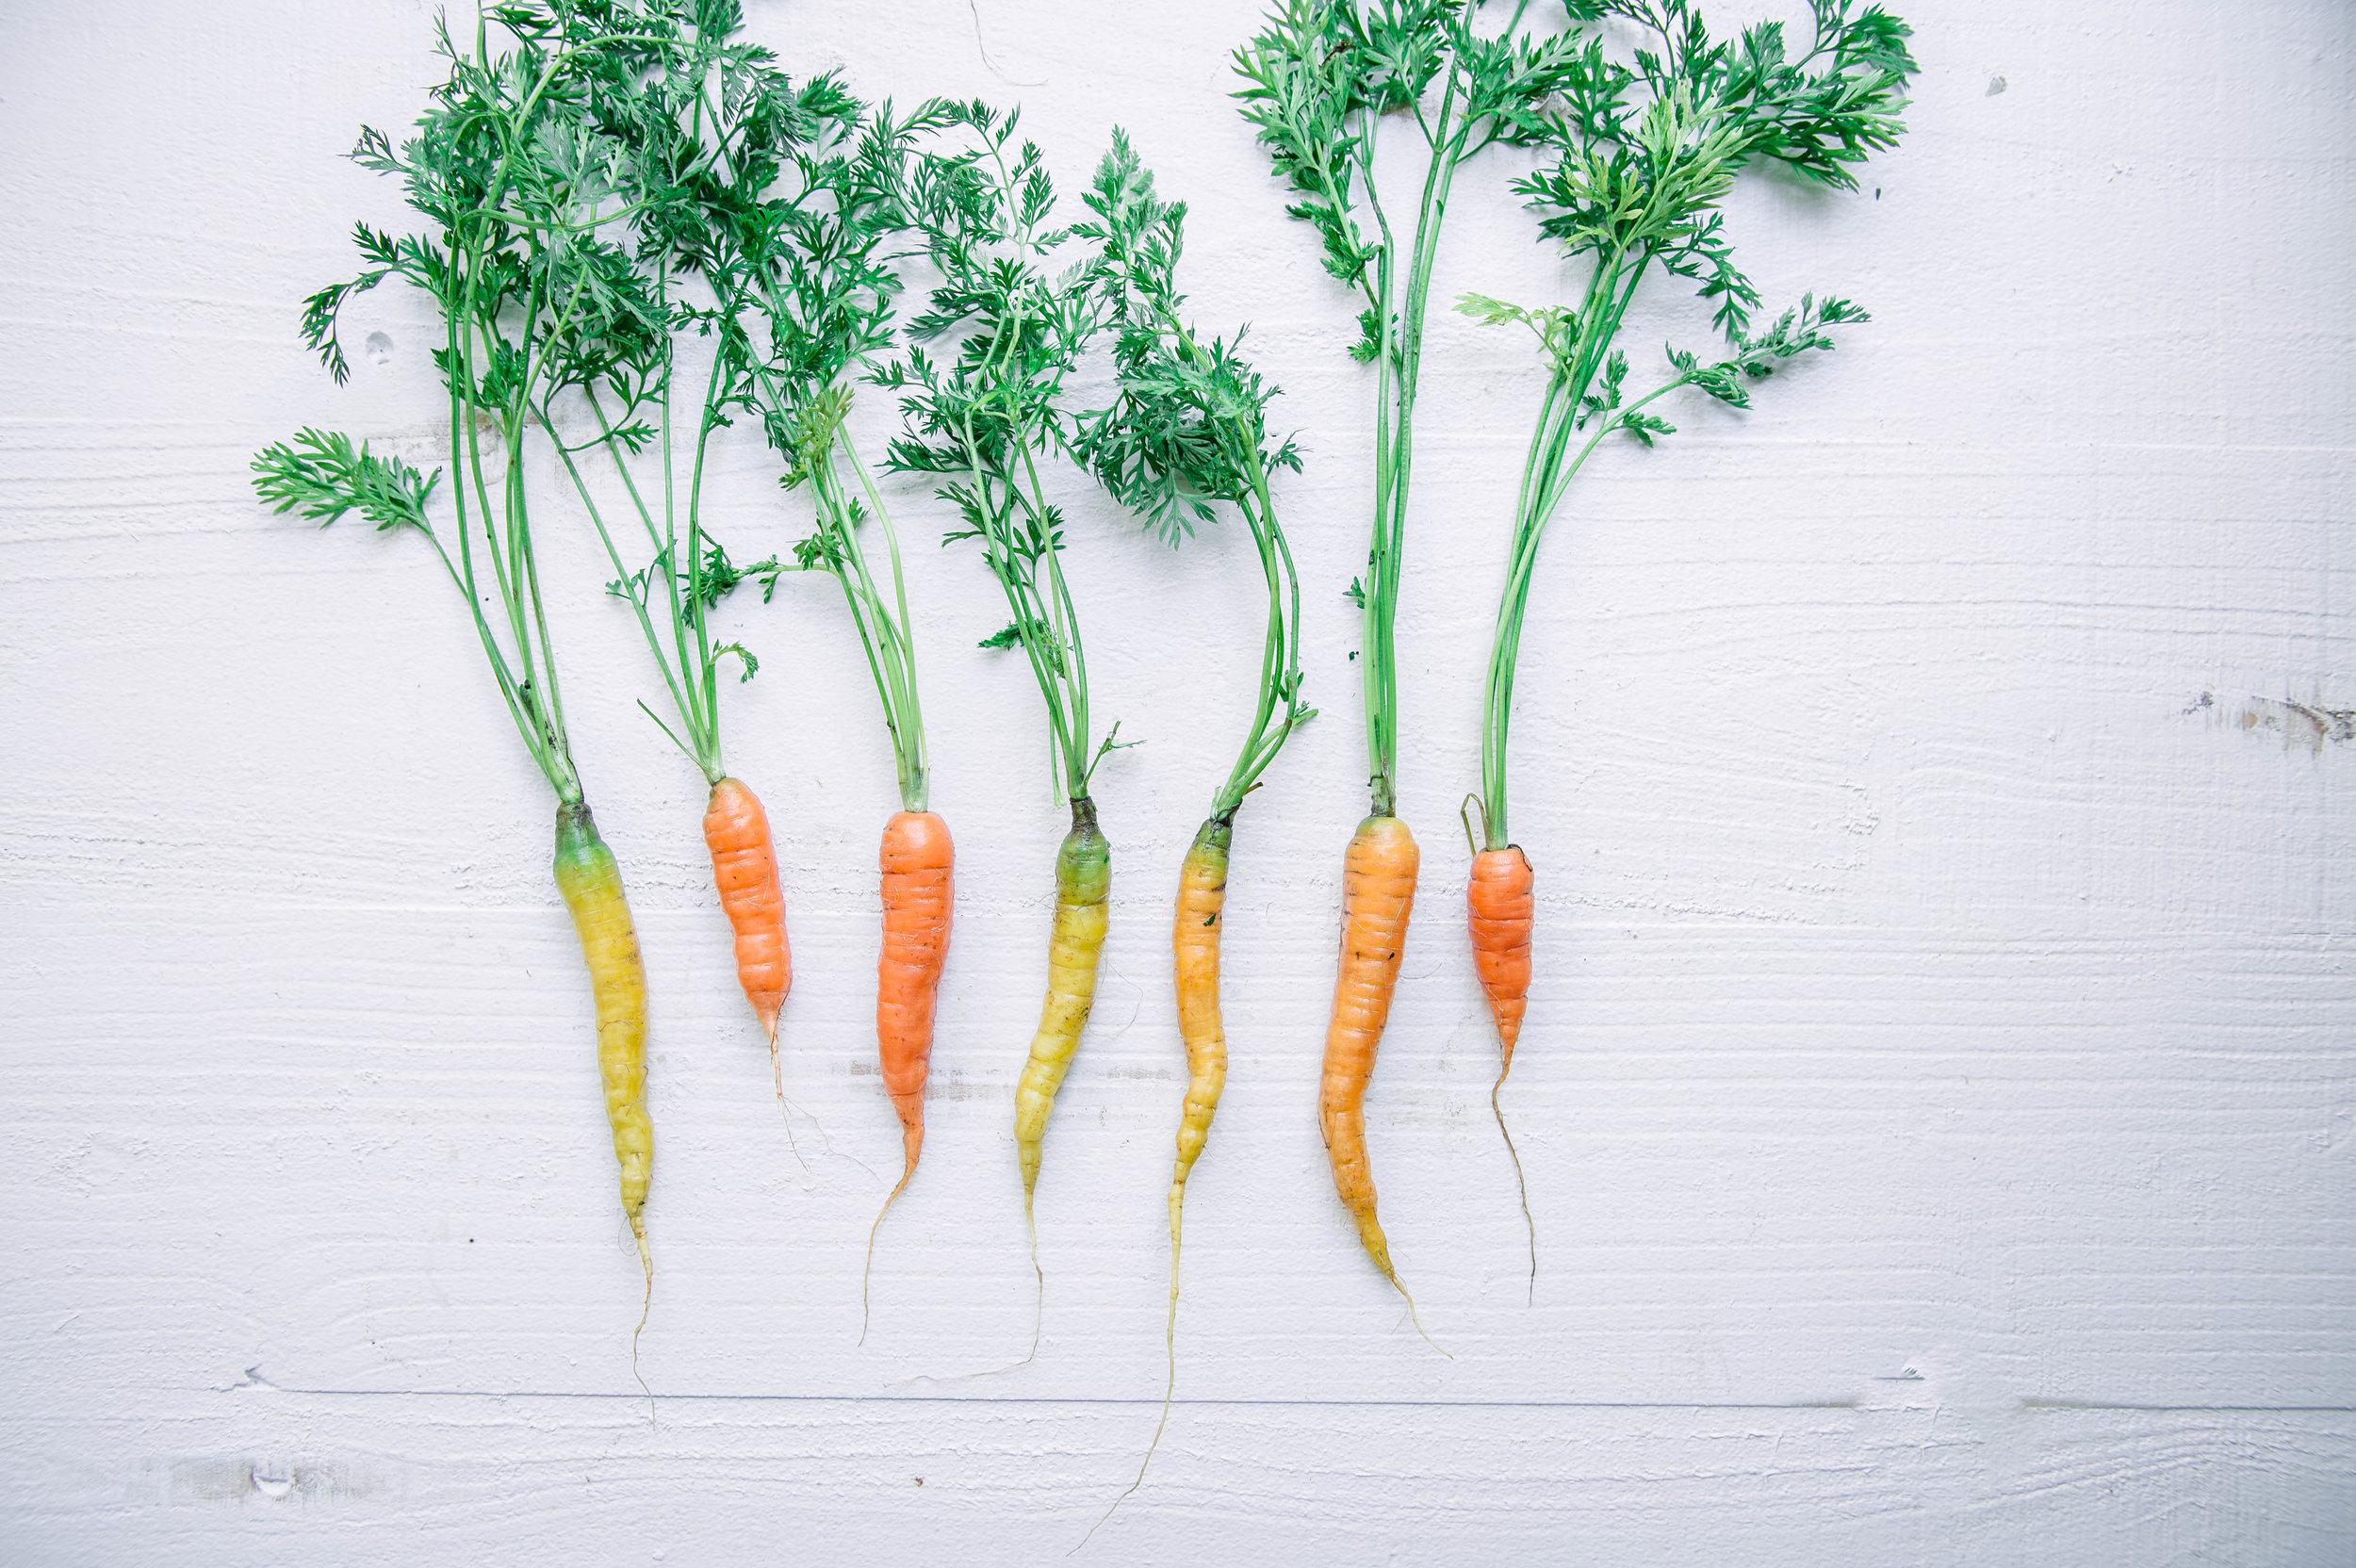 Baby carrots